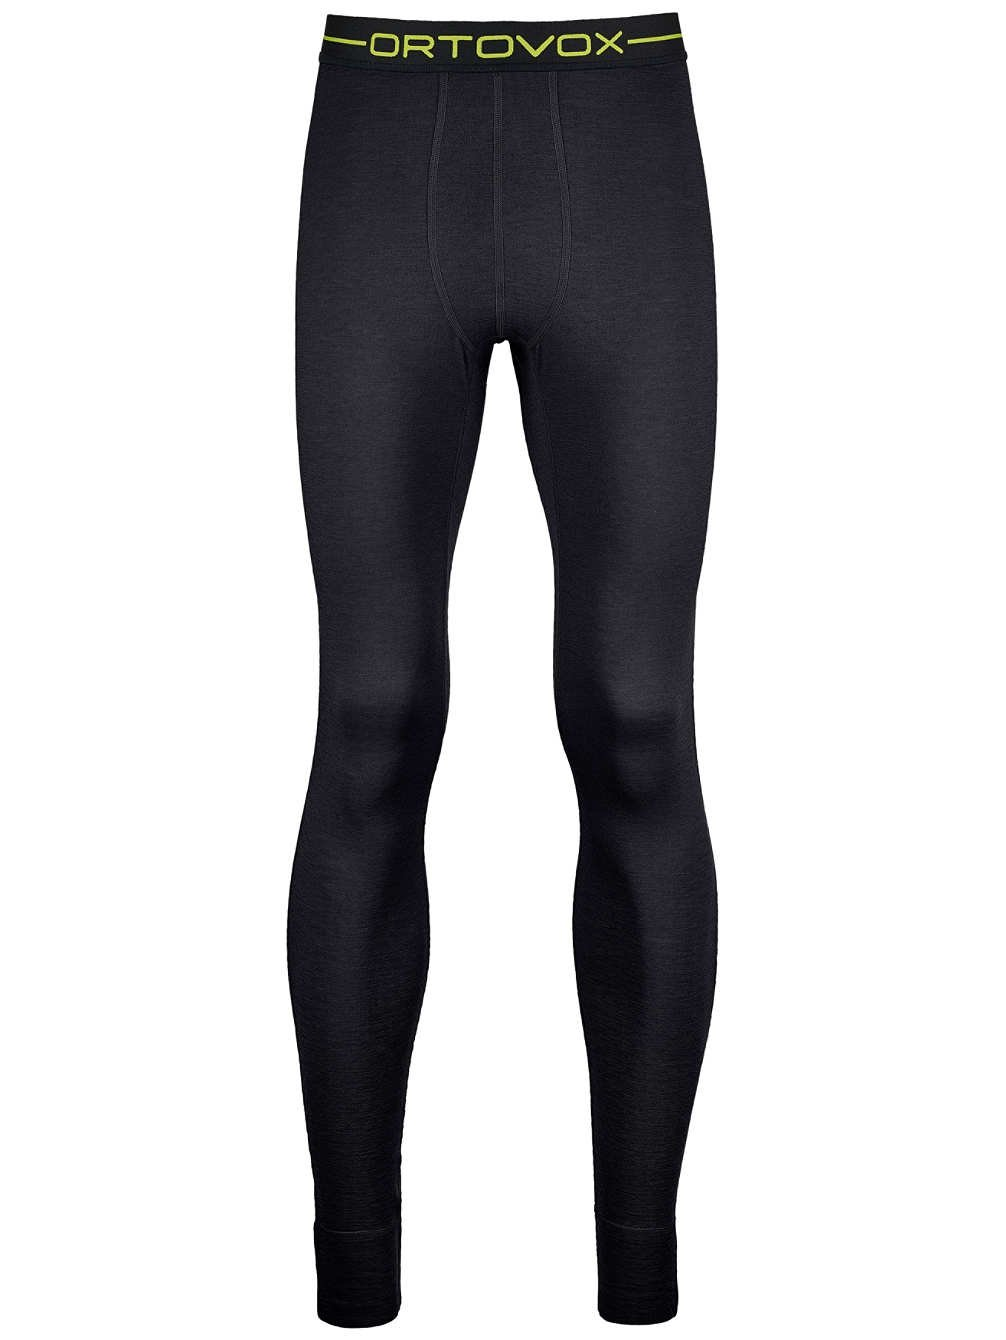 Ortovox 145 Ultra Long Pants M Thermo Hose, Herren